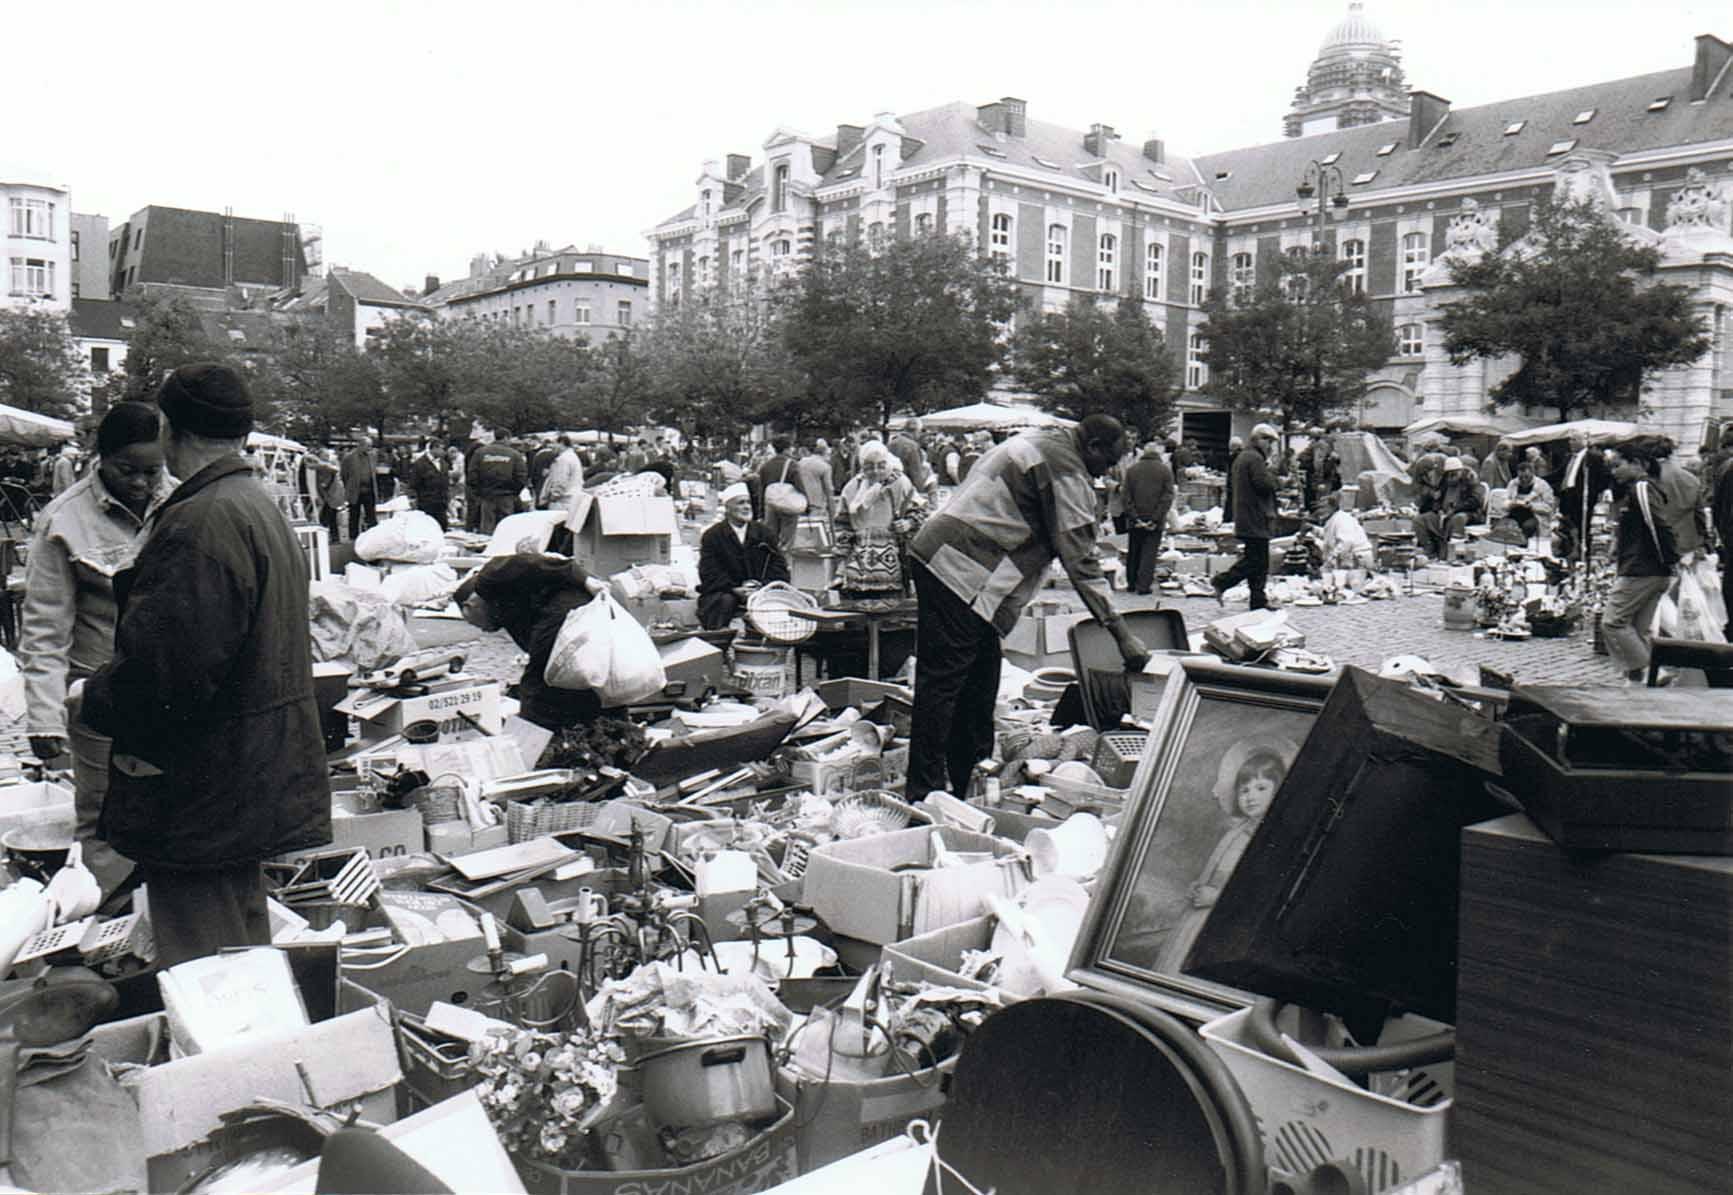 Brussel Marollen Flohmarkt Place du Jeu de Balle II